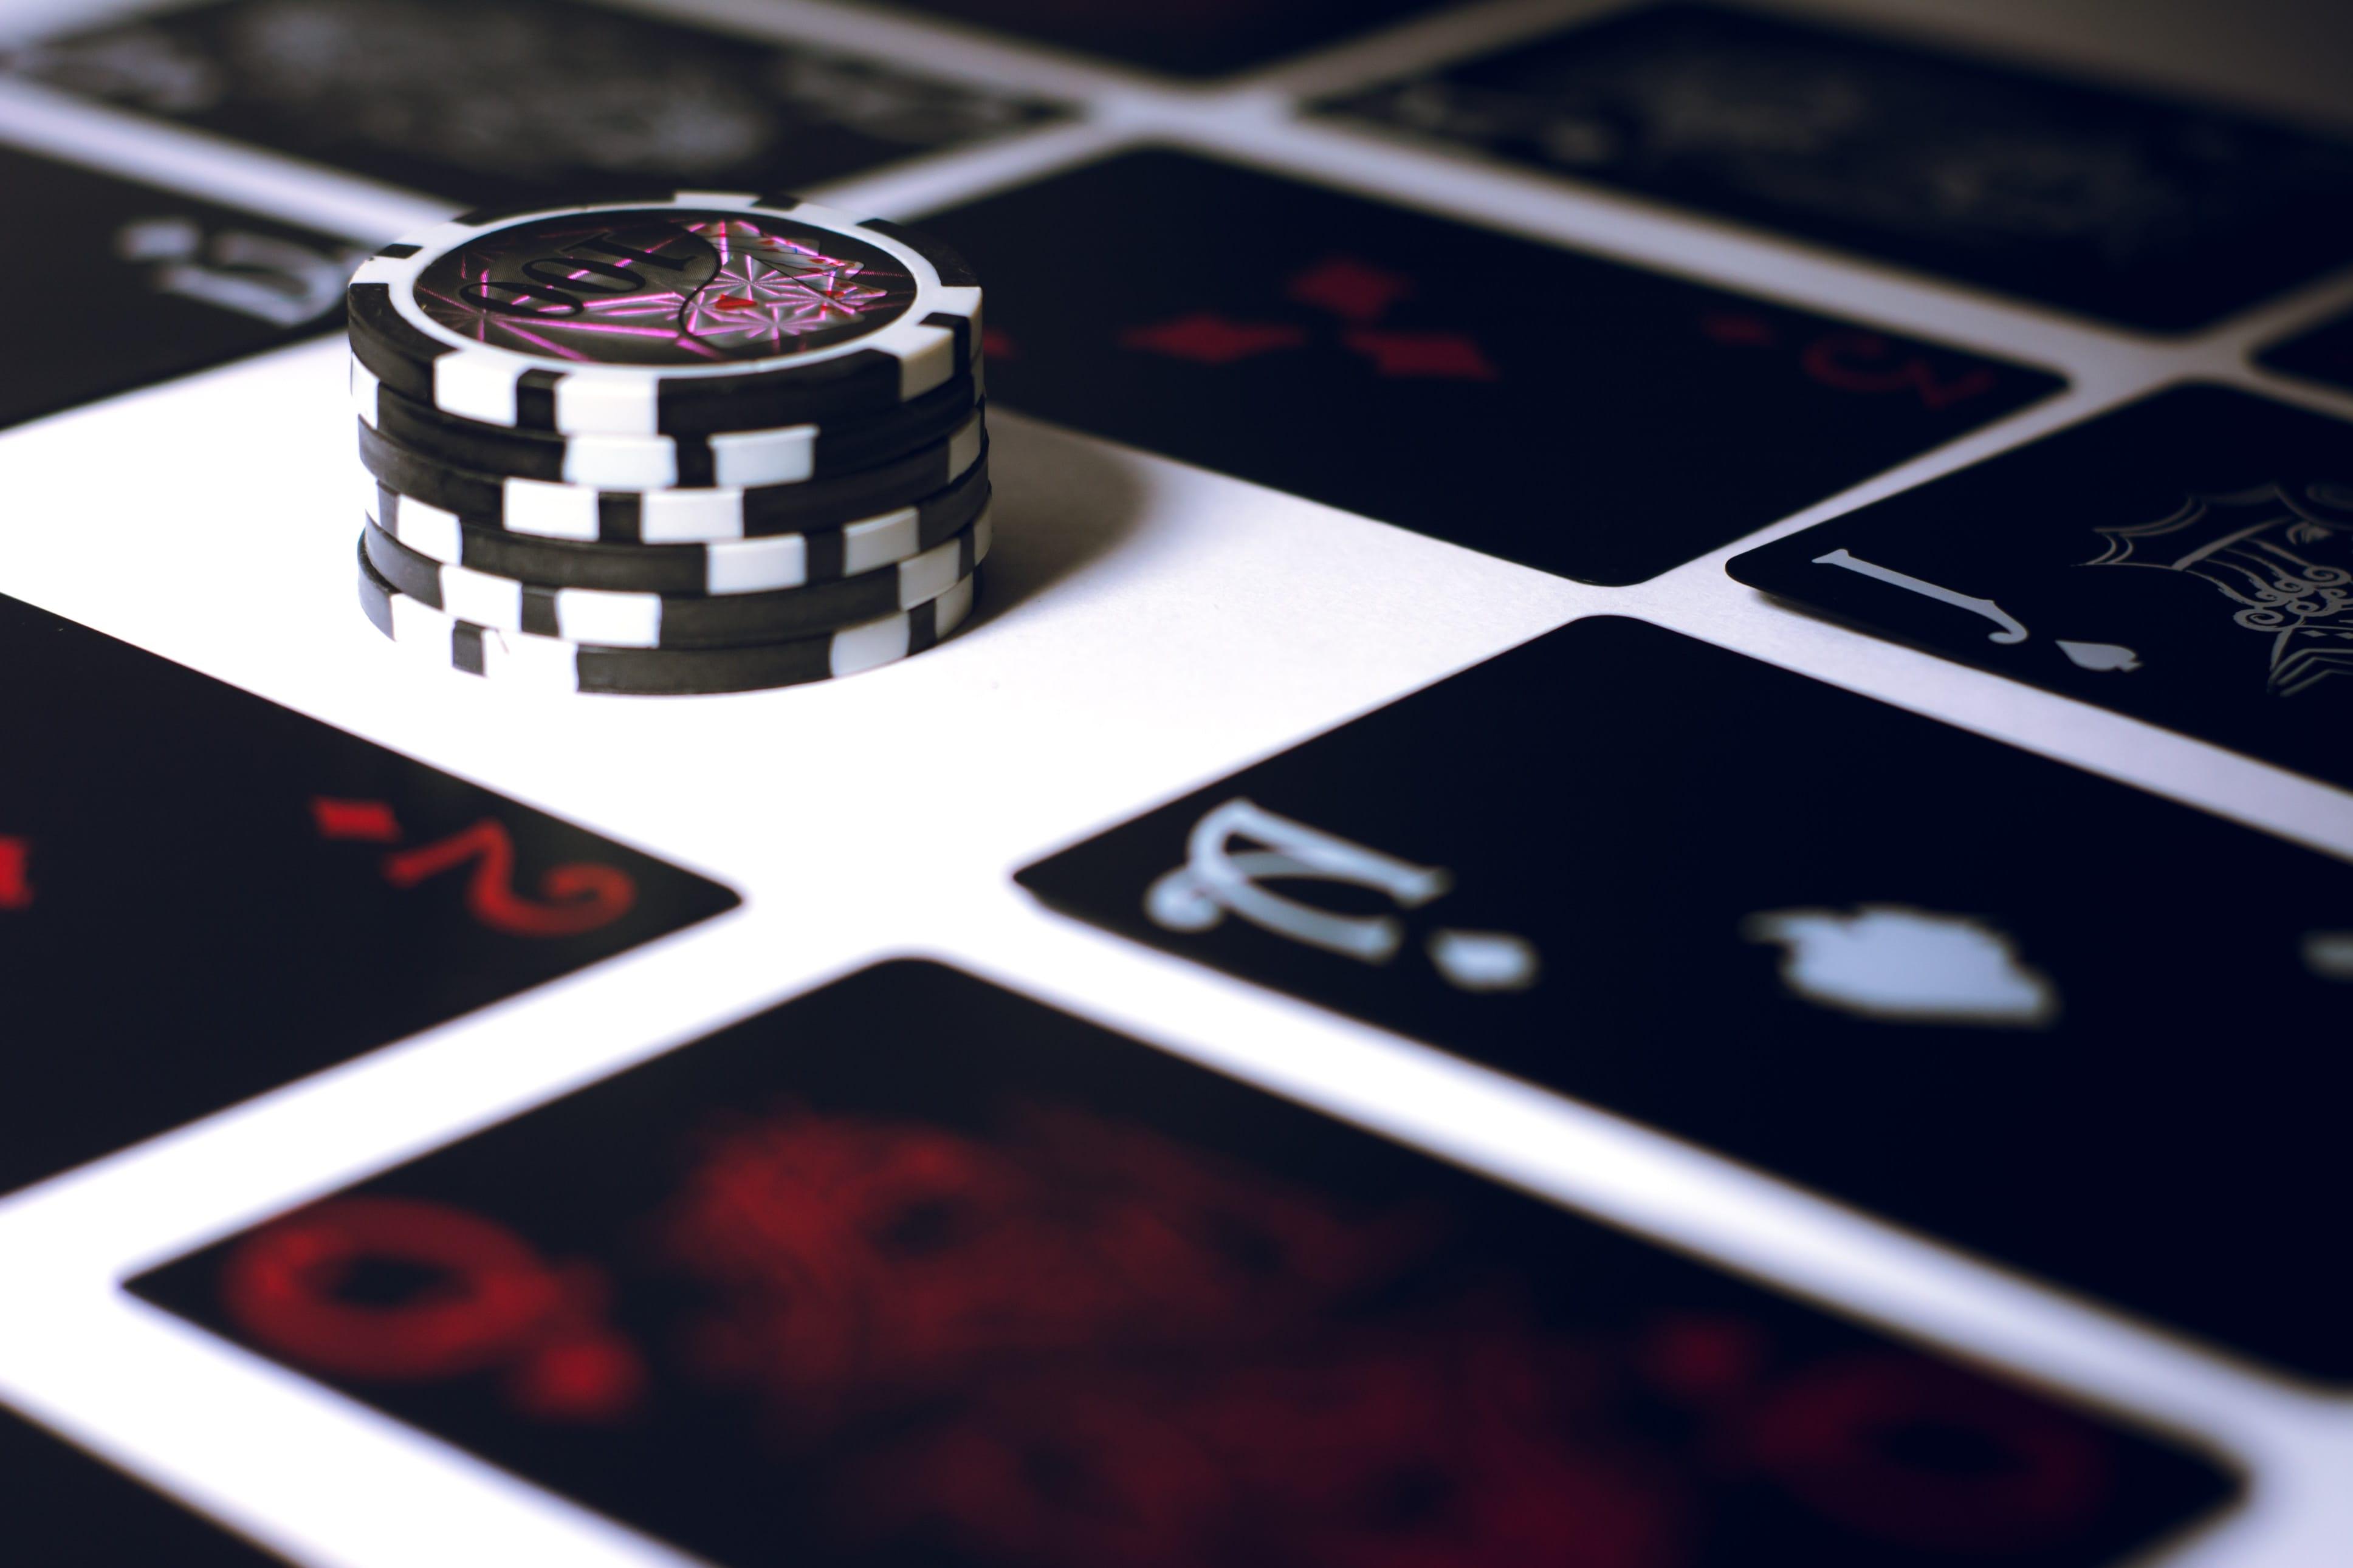 Poker chips on white surface; image by Esteban Lopez, via Unsplash.com.